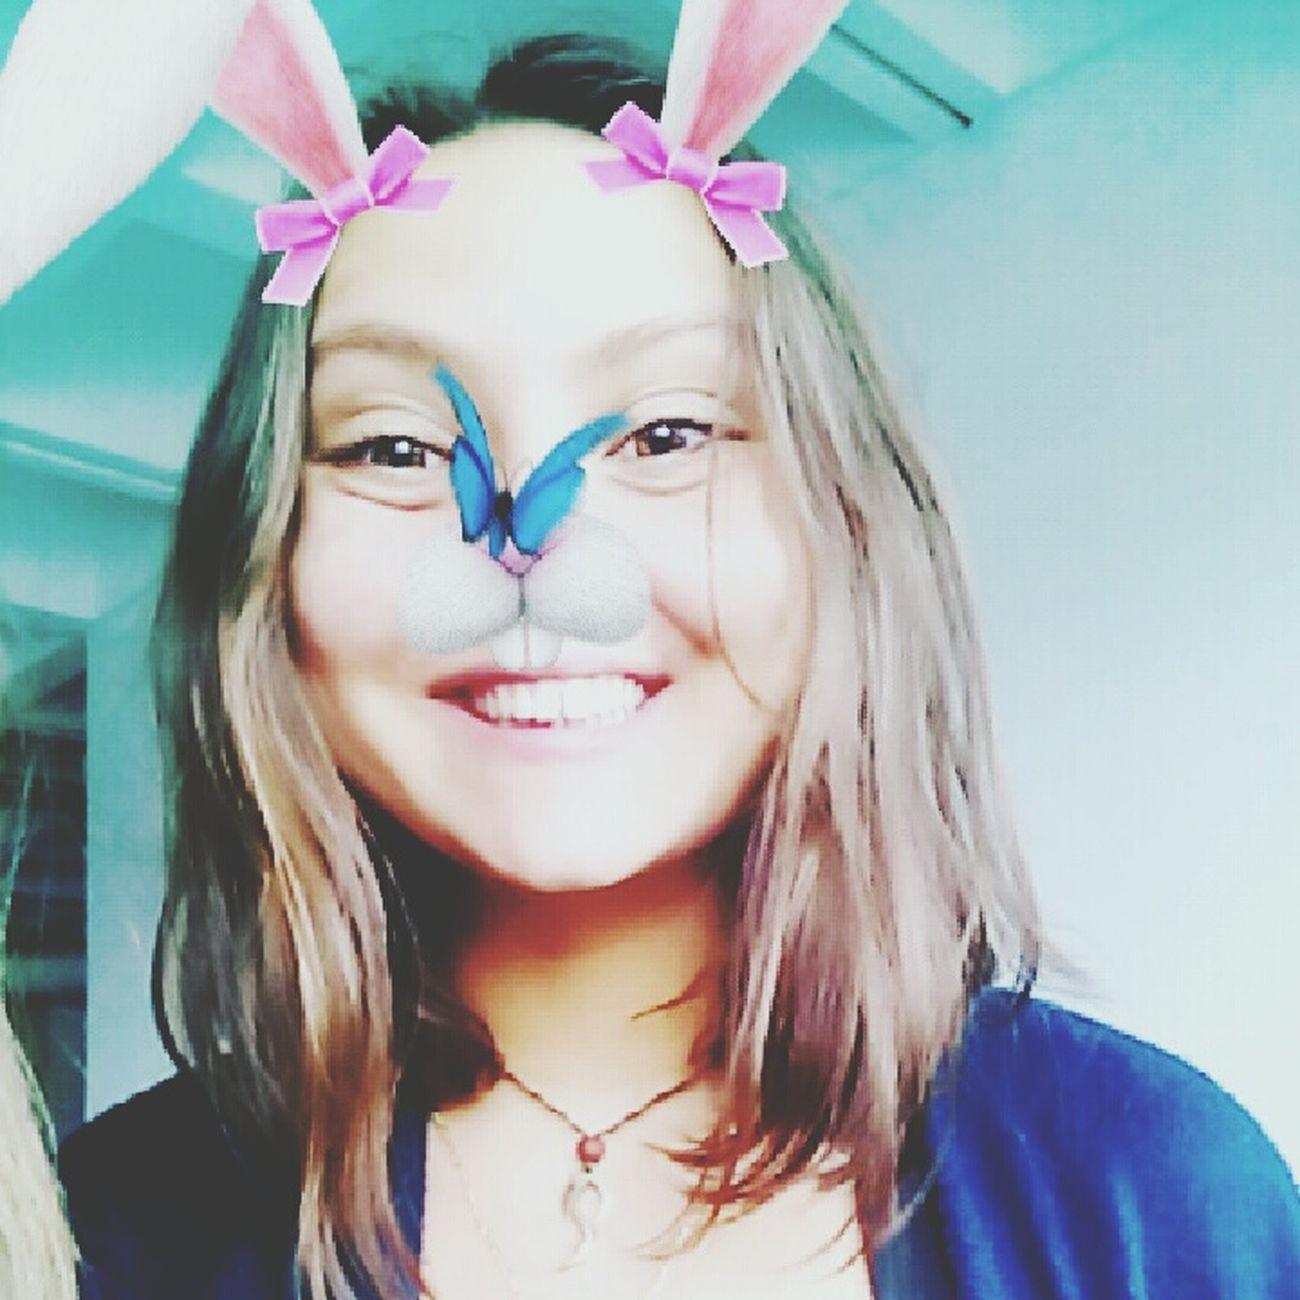 Taking Photos Verycool Enjoying Life Hi! That's Me Cheese! Rabbit ❤️ Lapine Buterfly Snapshots Of Life Snapchat